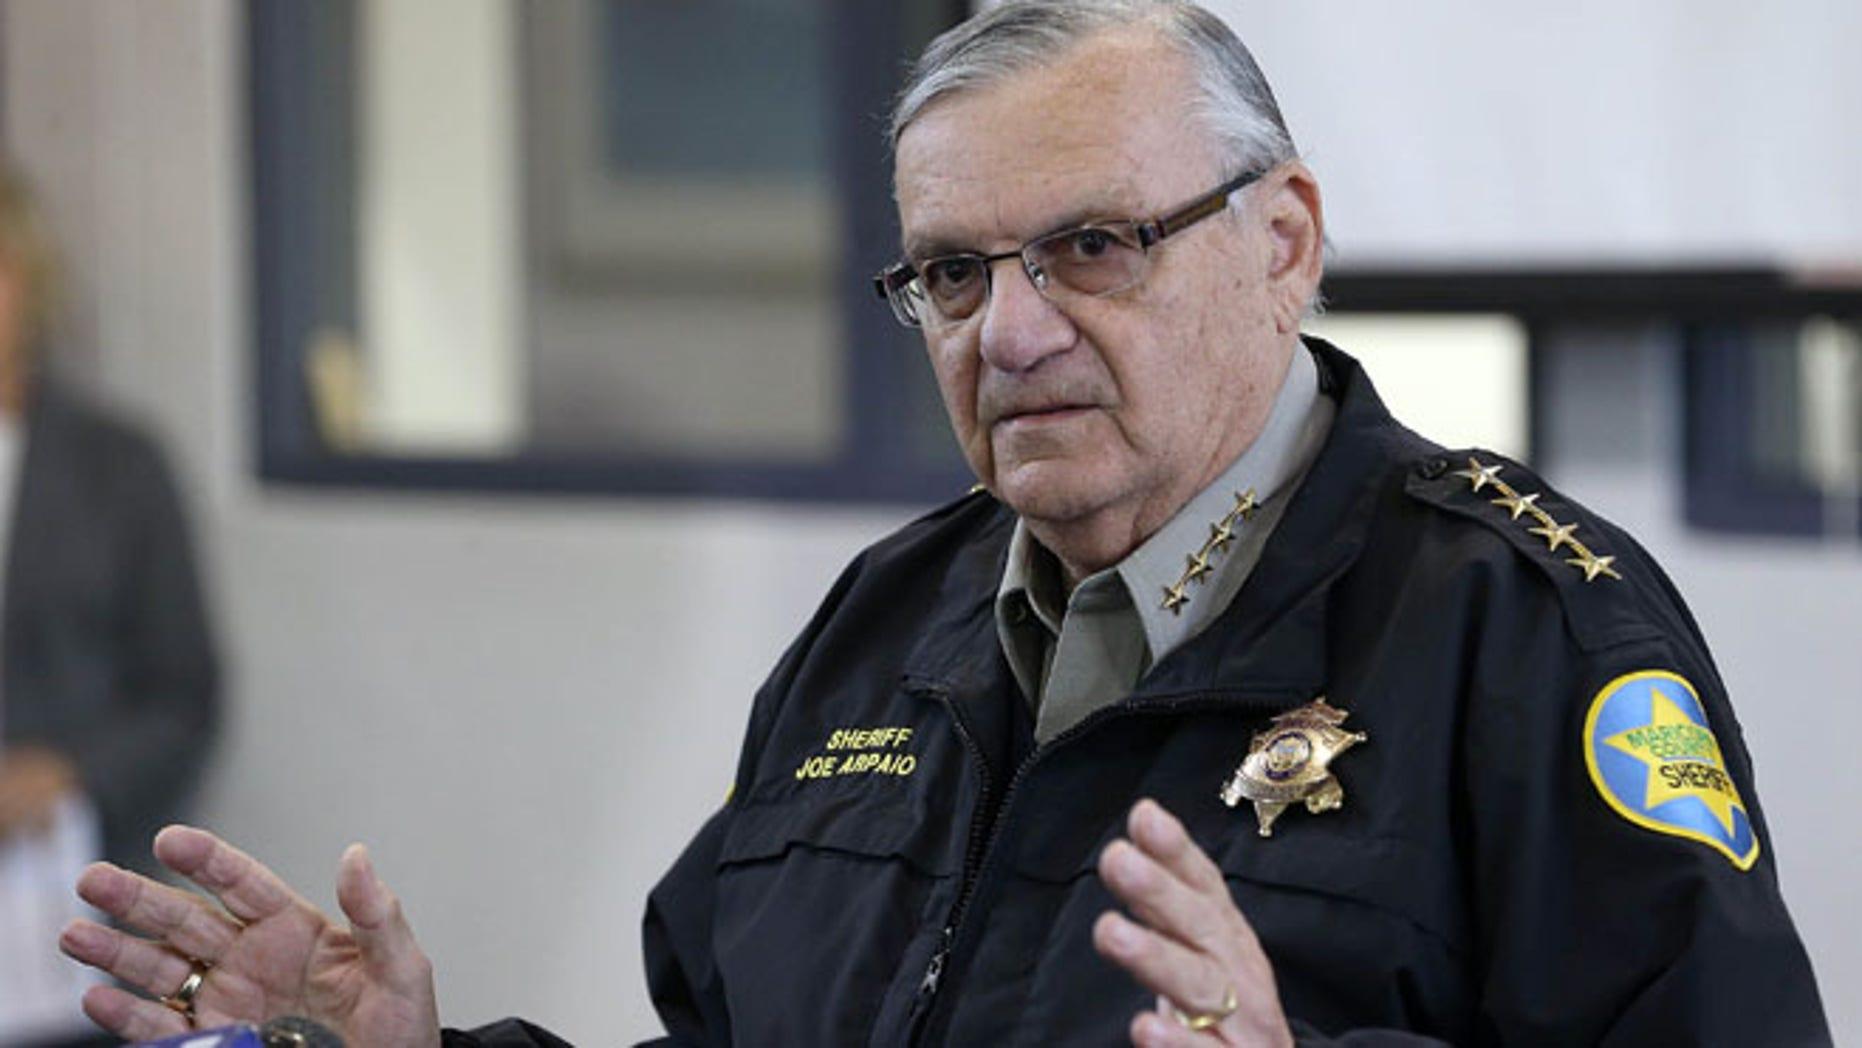 Feb. 9, 2013: Maricopa County Sheriff Joe Arpaio addresses the media about a simulated school shooting in Fountain Hills, Arizona.